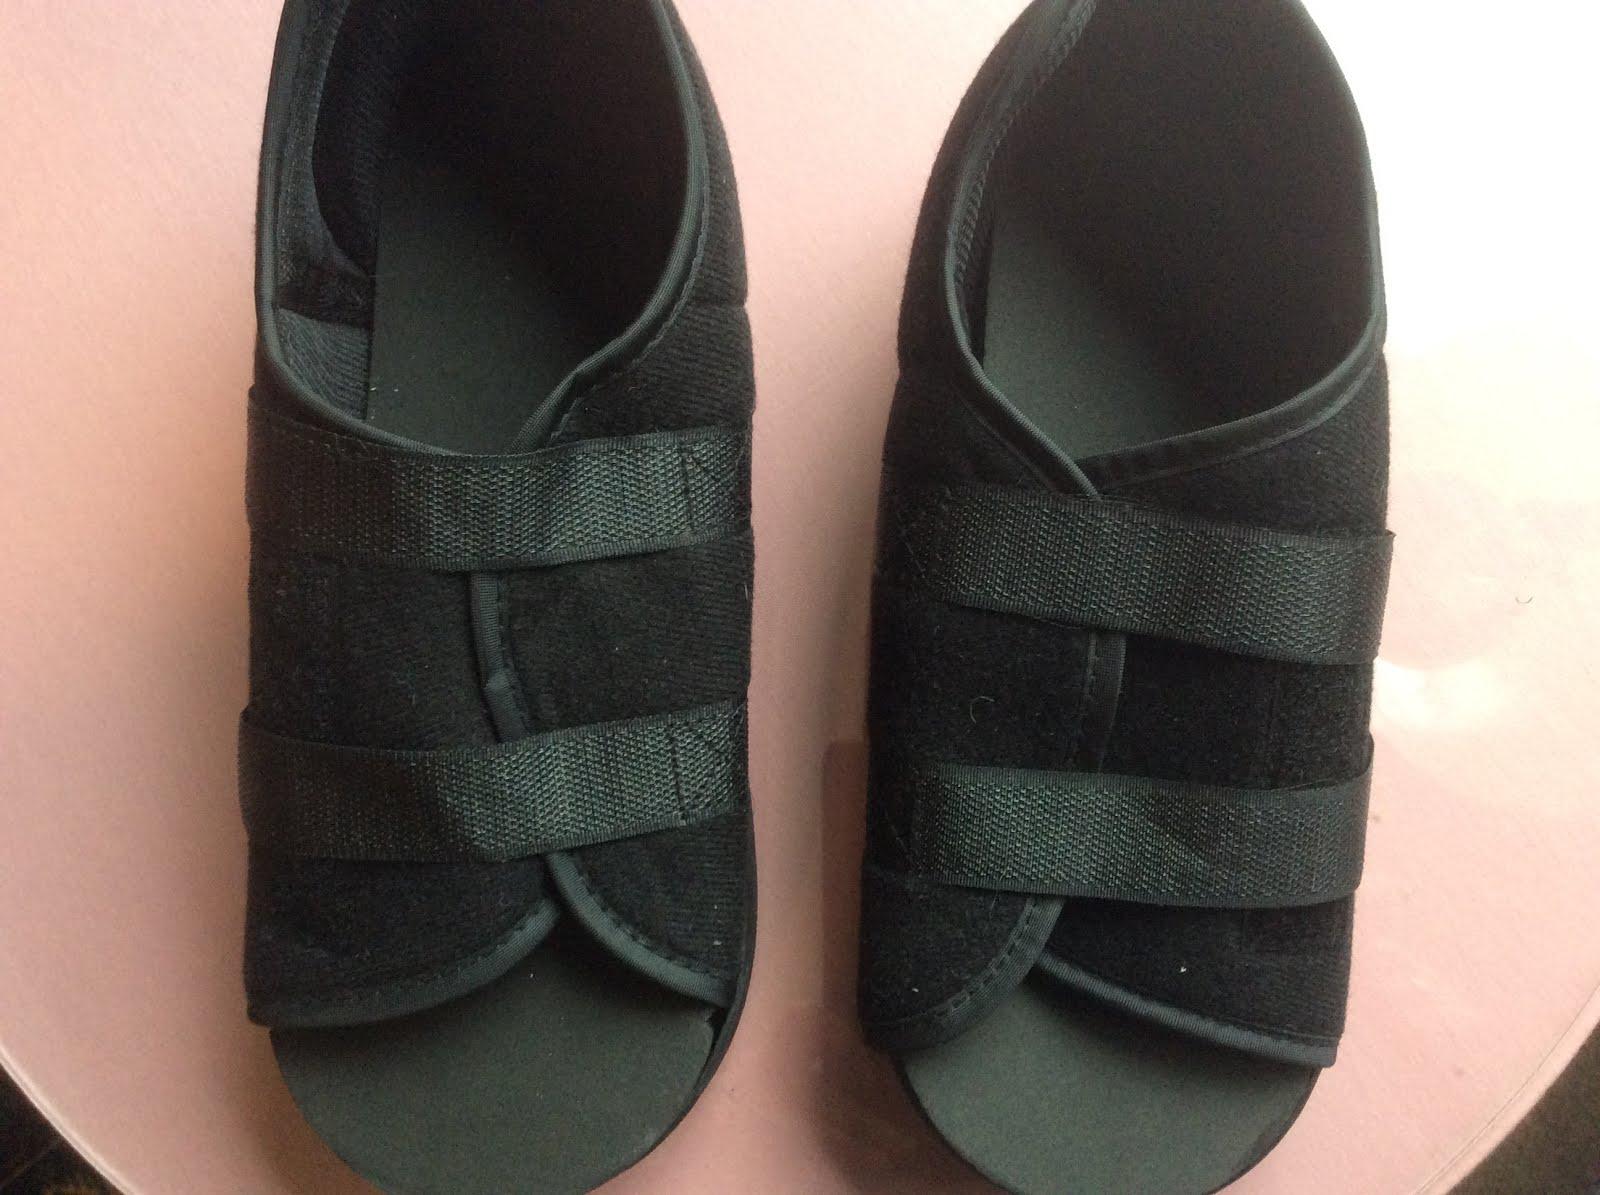 Zapatos Para Rastreo Biomagnetico $45